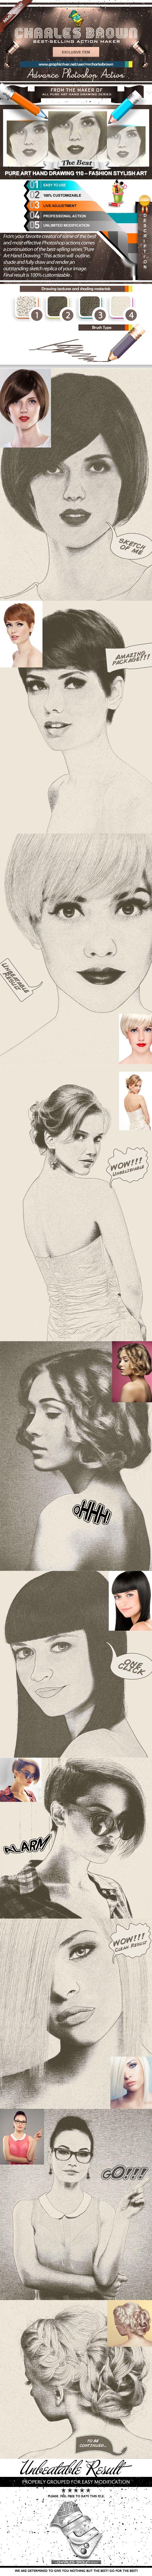 Pure Art Hand Drawing 110 – Fashion Stylish Art - Photo Effects Actions